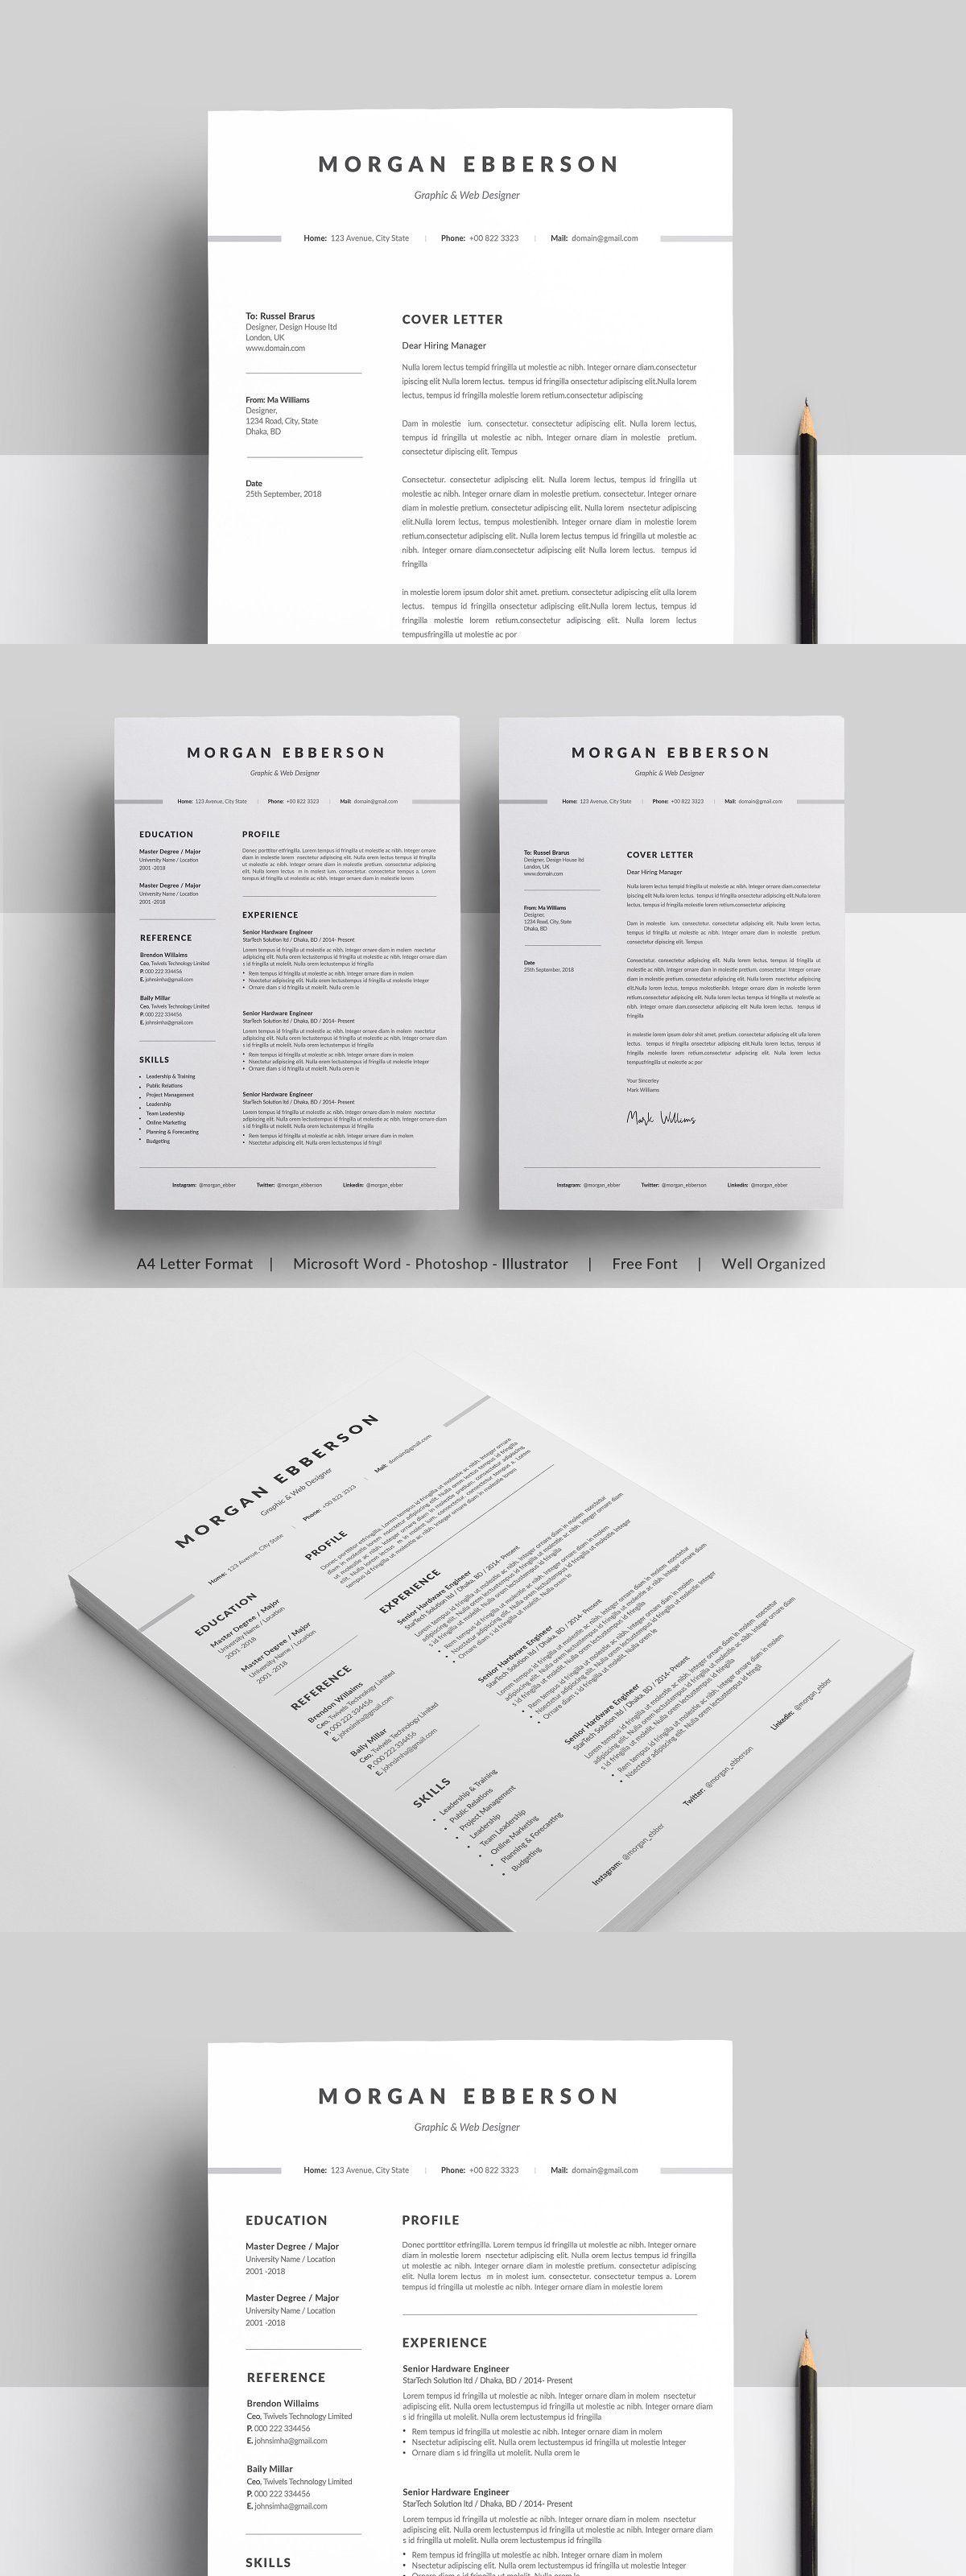 Resume in 2020 Clean resume template, Resume template